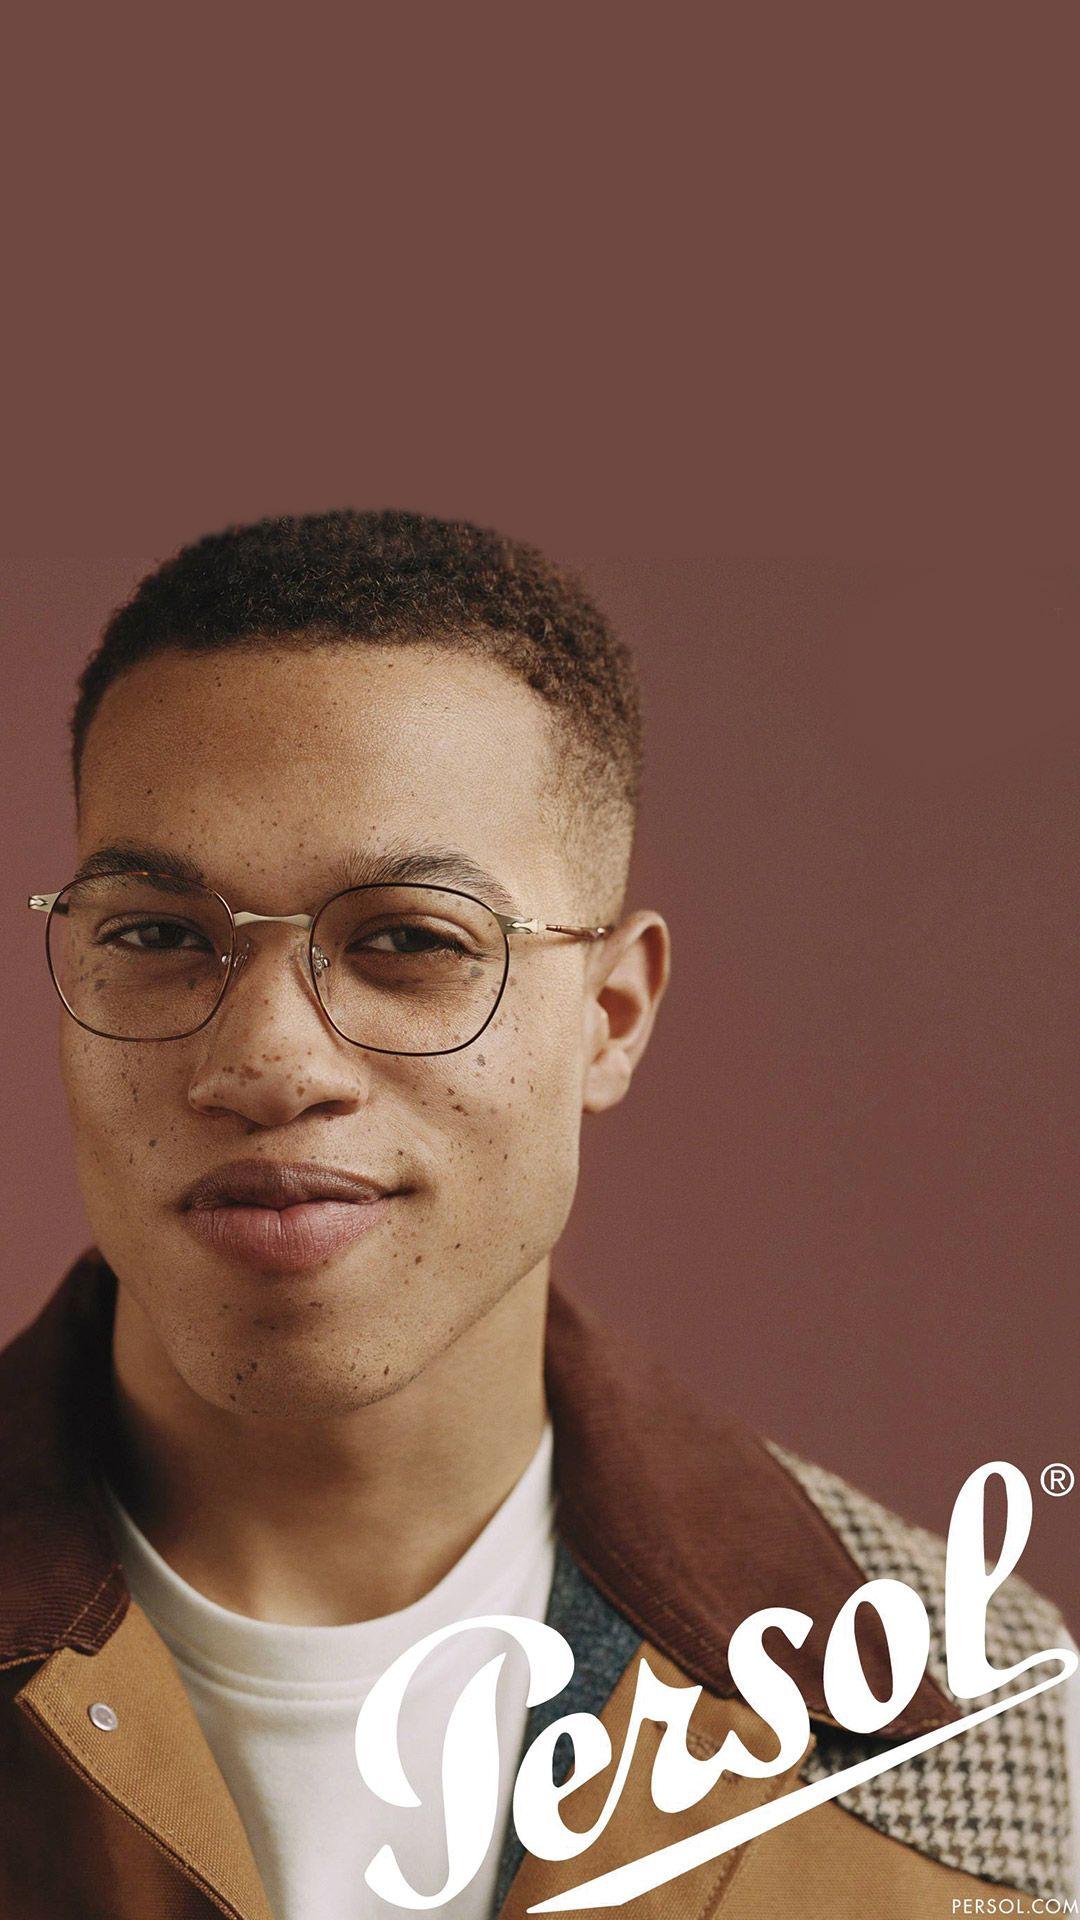 Pin De Ahoua Koulibali Em Eye Candy Homens De Oculos Oculos De